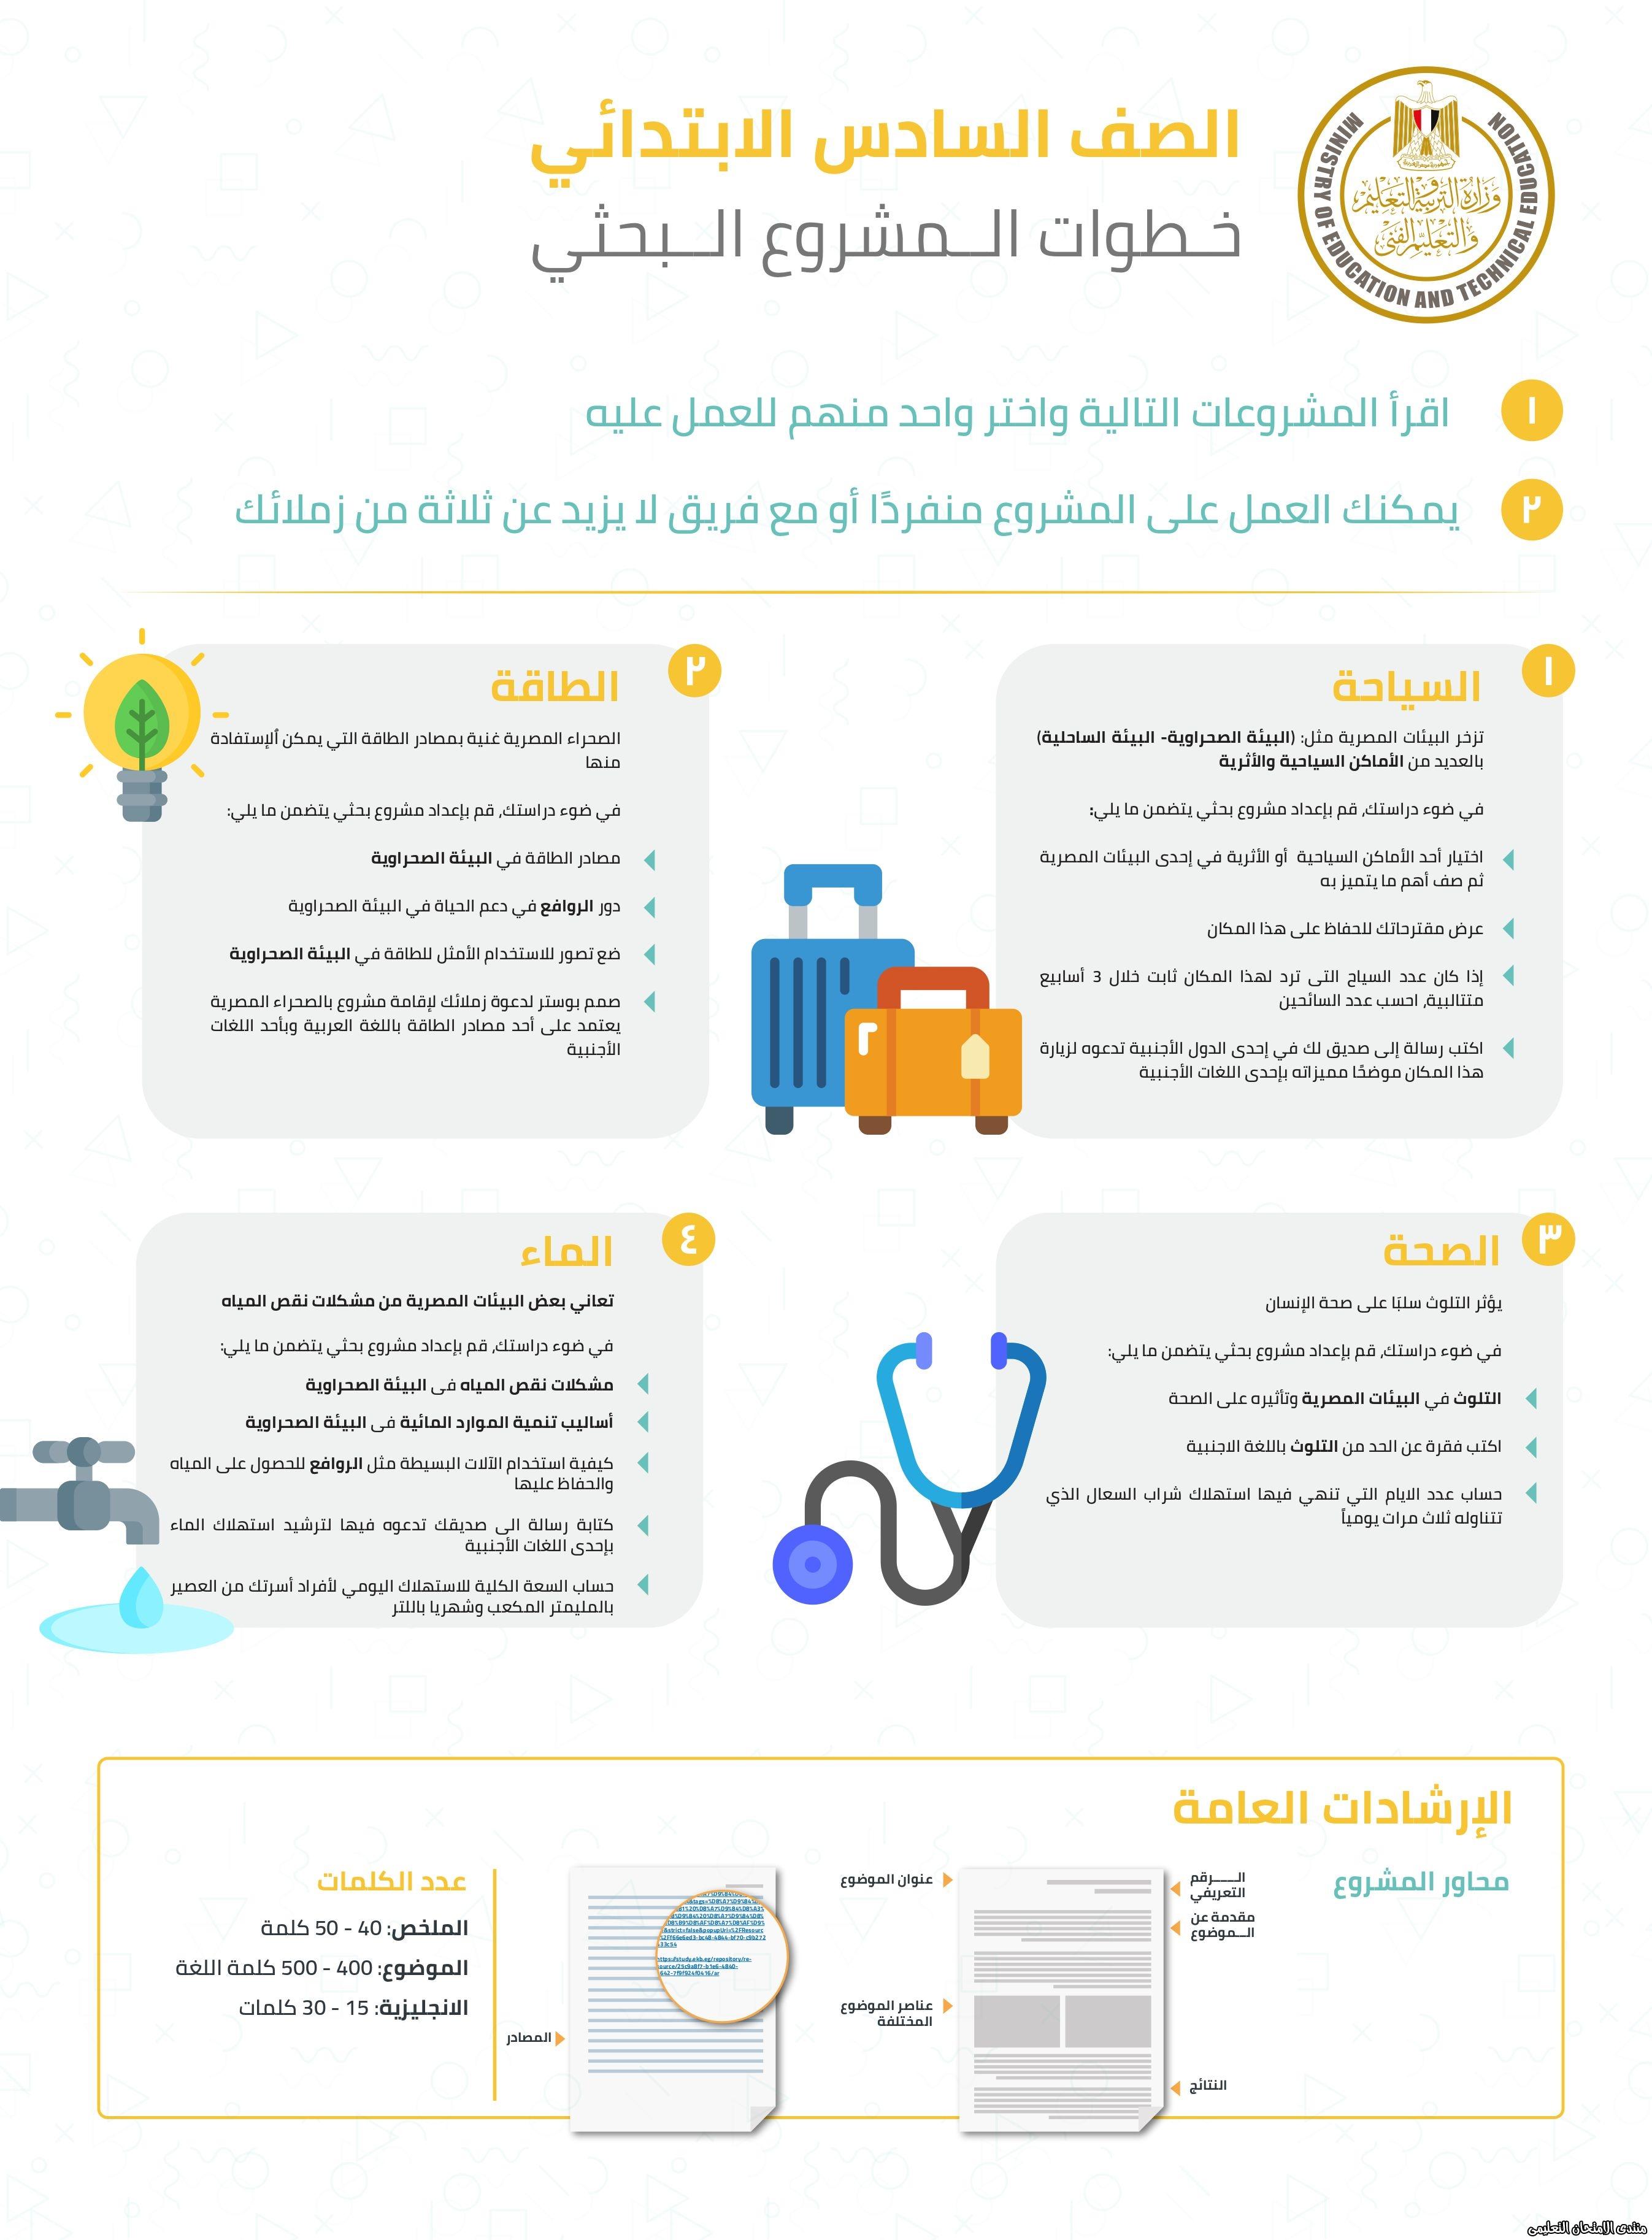 exam-eg.com_158643950691544.jpg